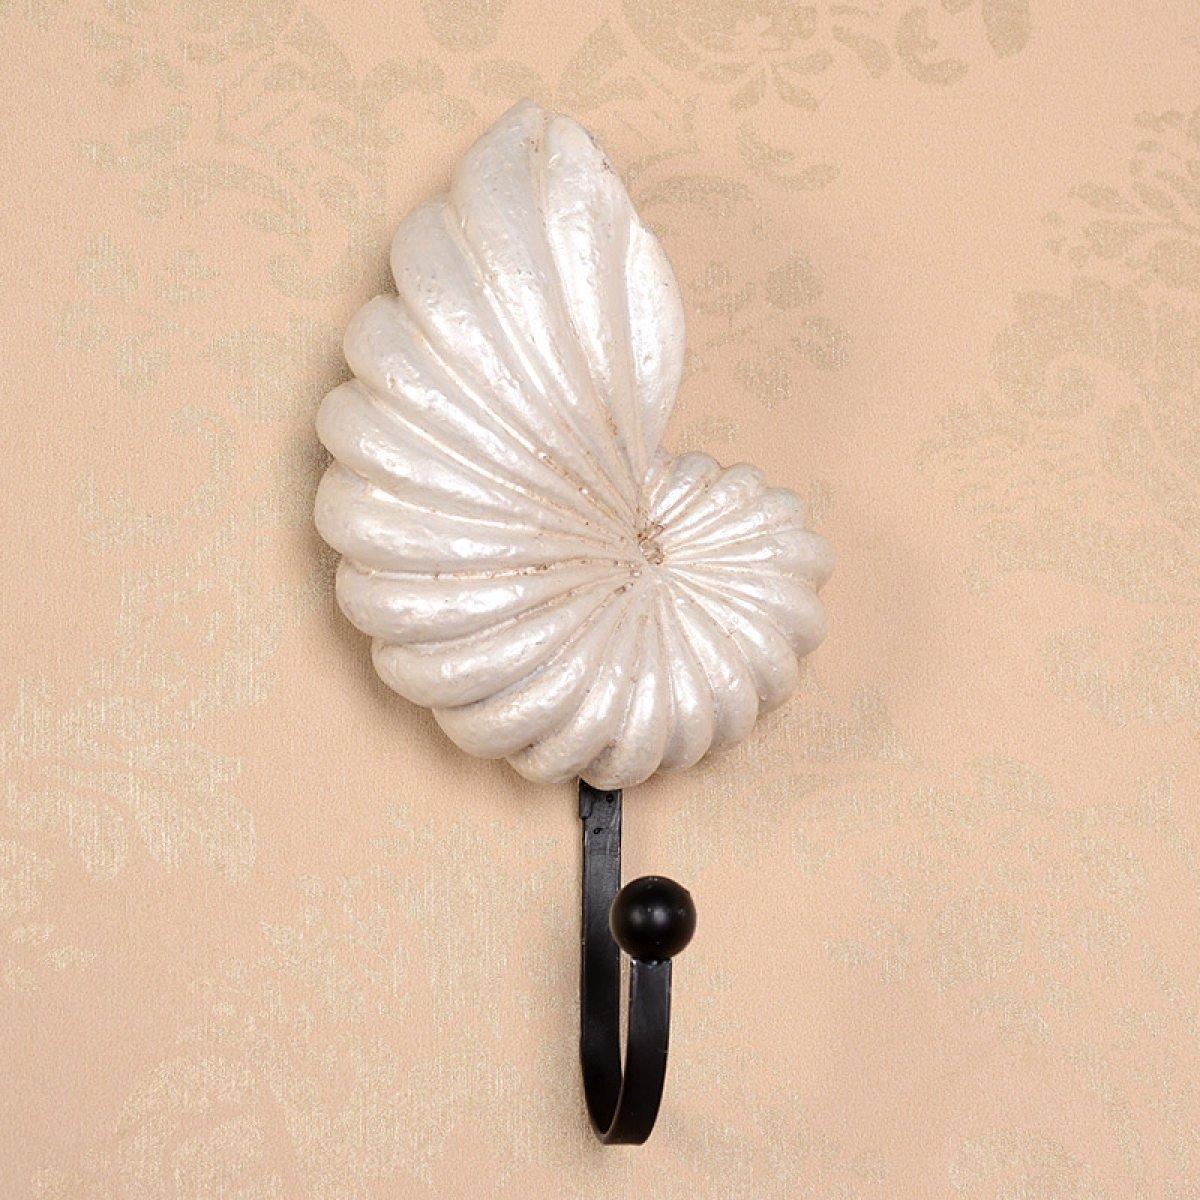 Amazon.com: DEAI - Elegante perchero de resina con diseño de ...